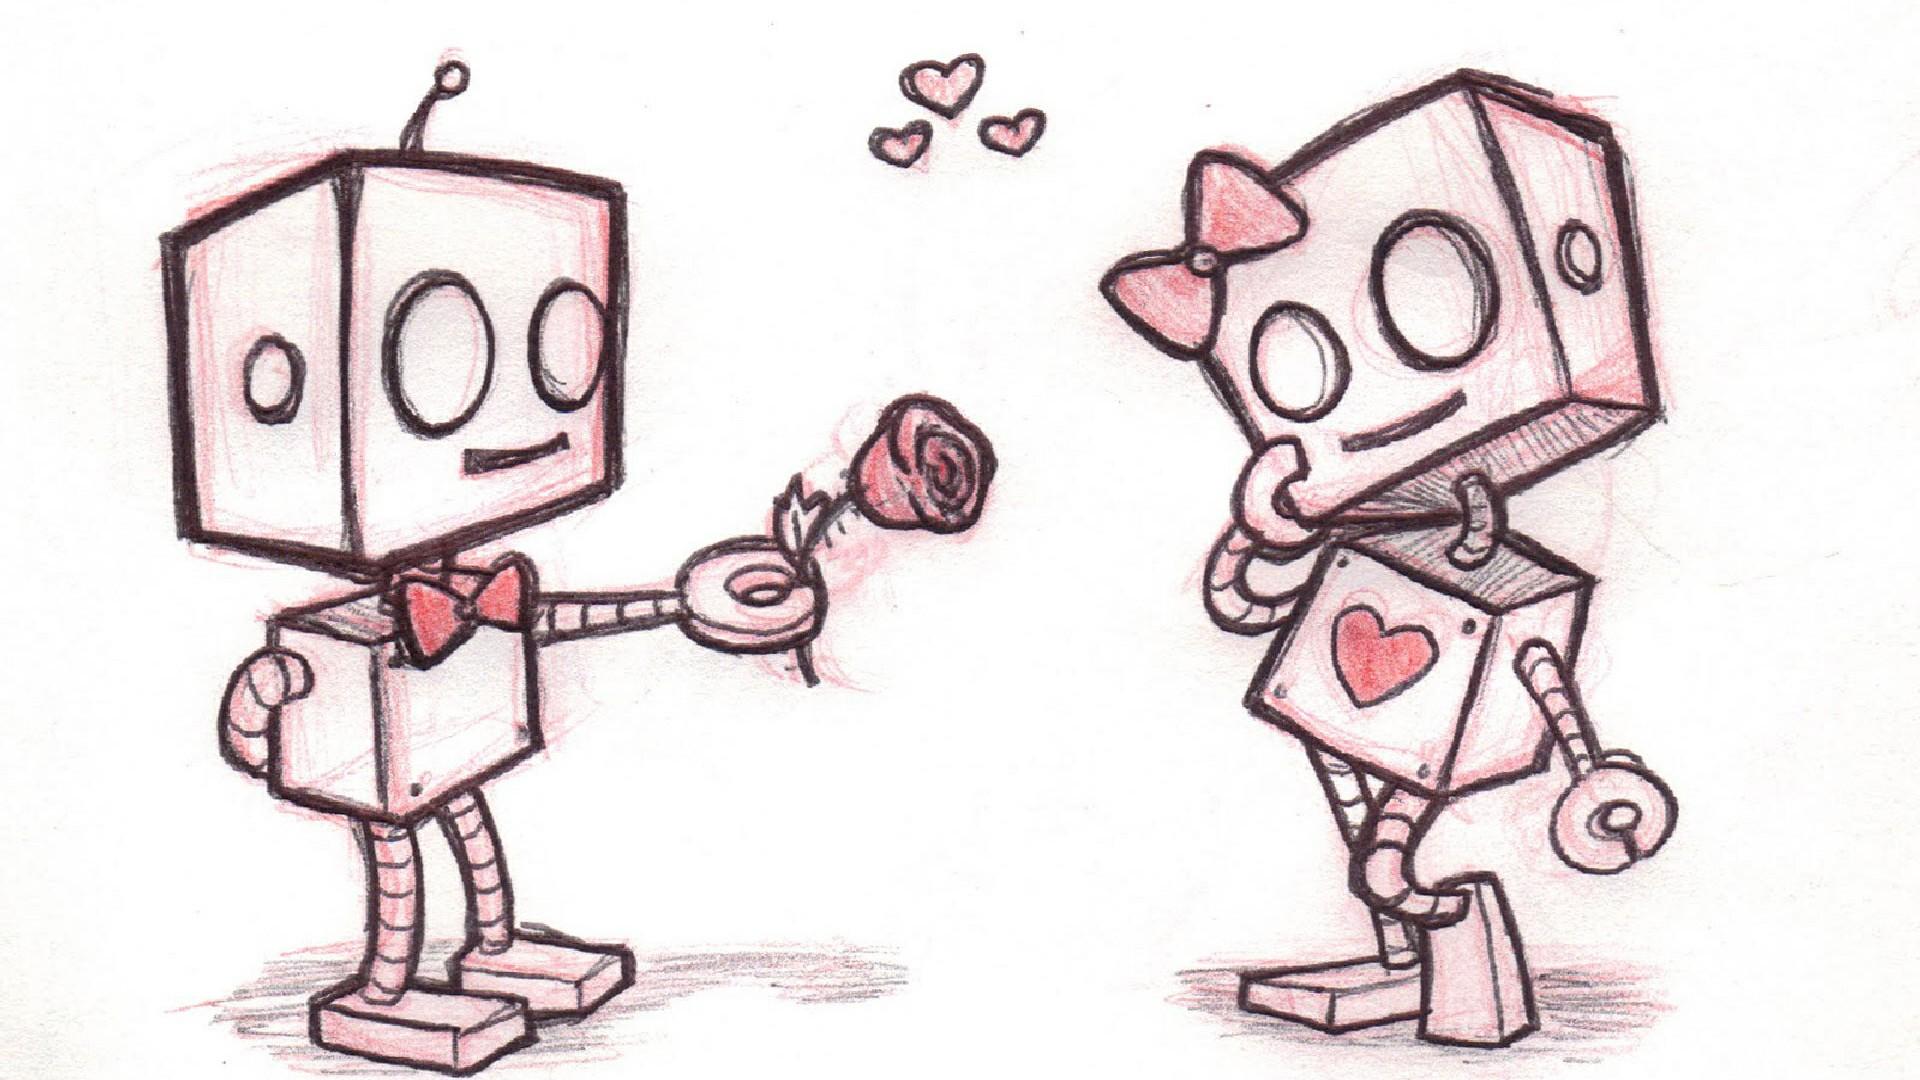 Robot Love Easy Drawing Wallpaper | Wallpaper Studio 10 | Tens of ...